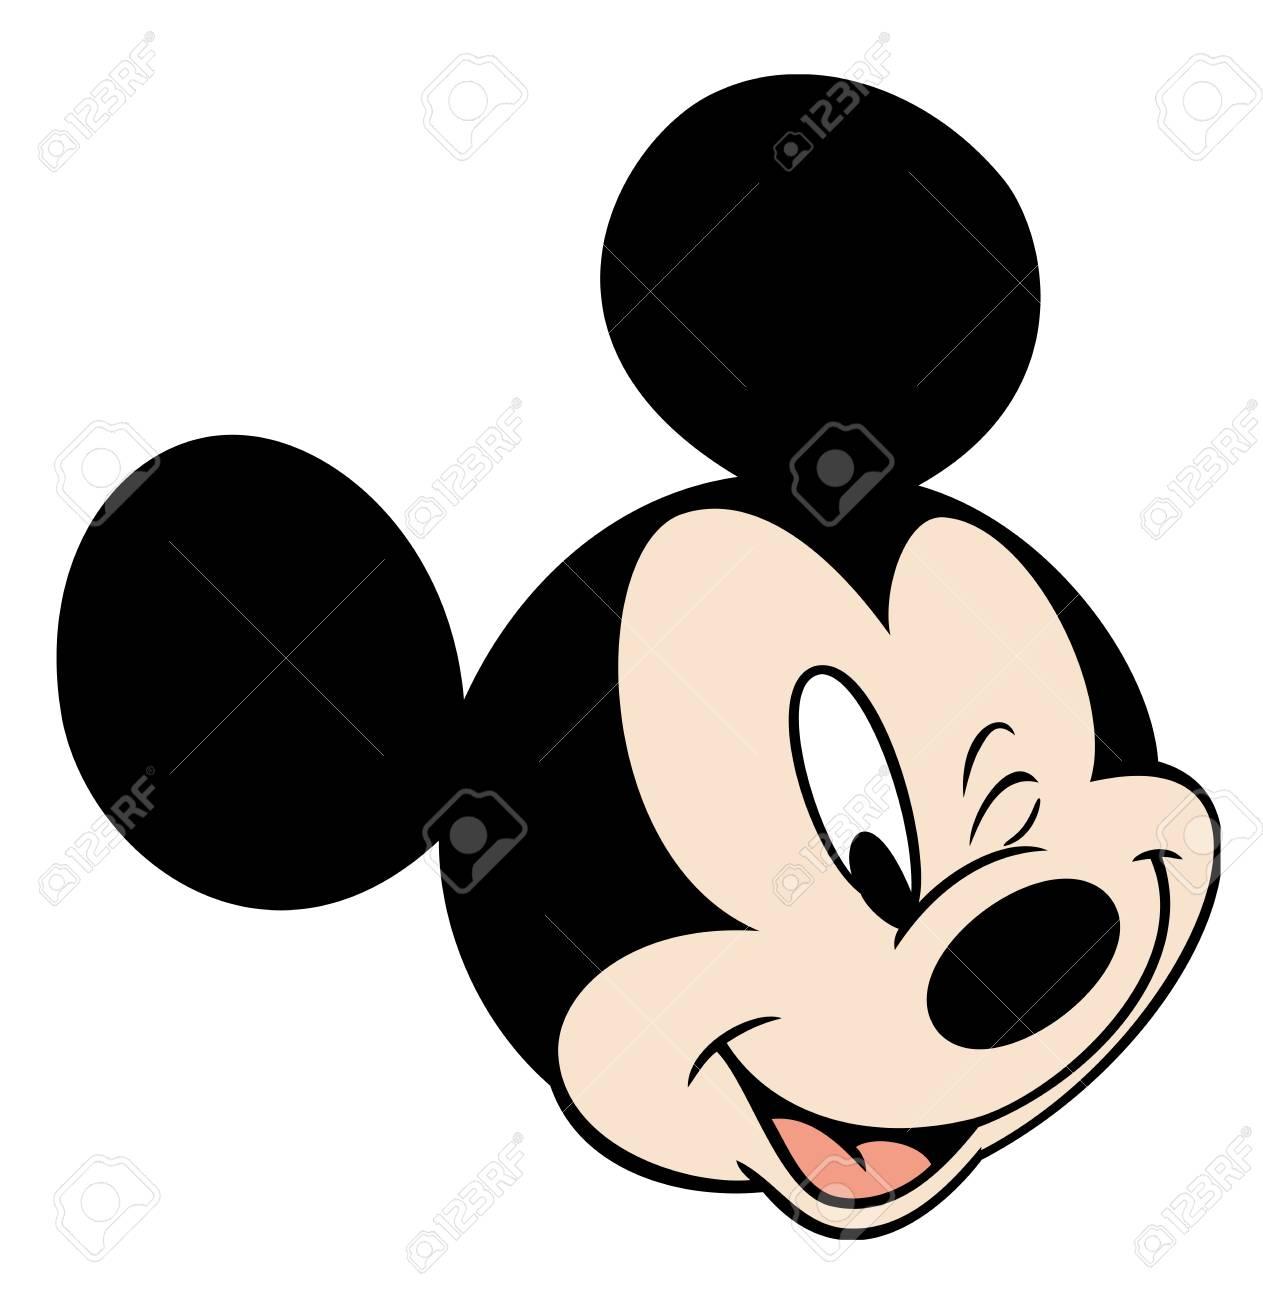 mickey mouse head character cartoon winking eye illustration stock rh 123rf com Minnie Mouse Head Clip Art Clip Art Minnie Mouse Outfit